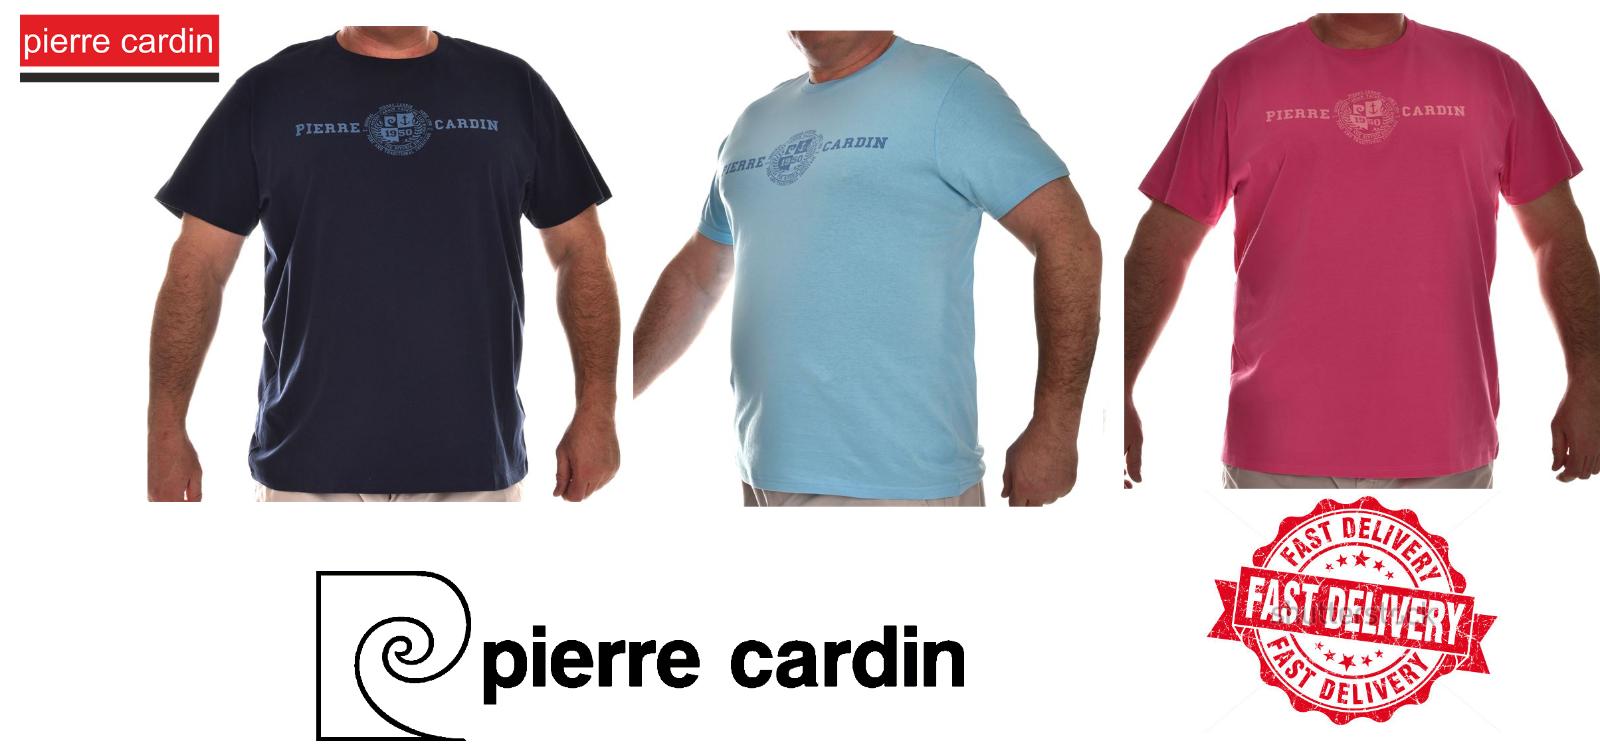 Pierre Cardin XL Pastel T Shirt Mens Big Size T-Shirt 3XL 4XL - $9.99